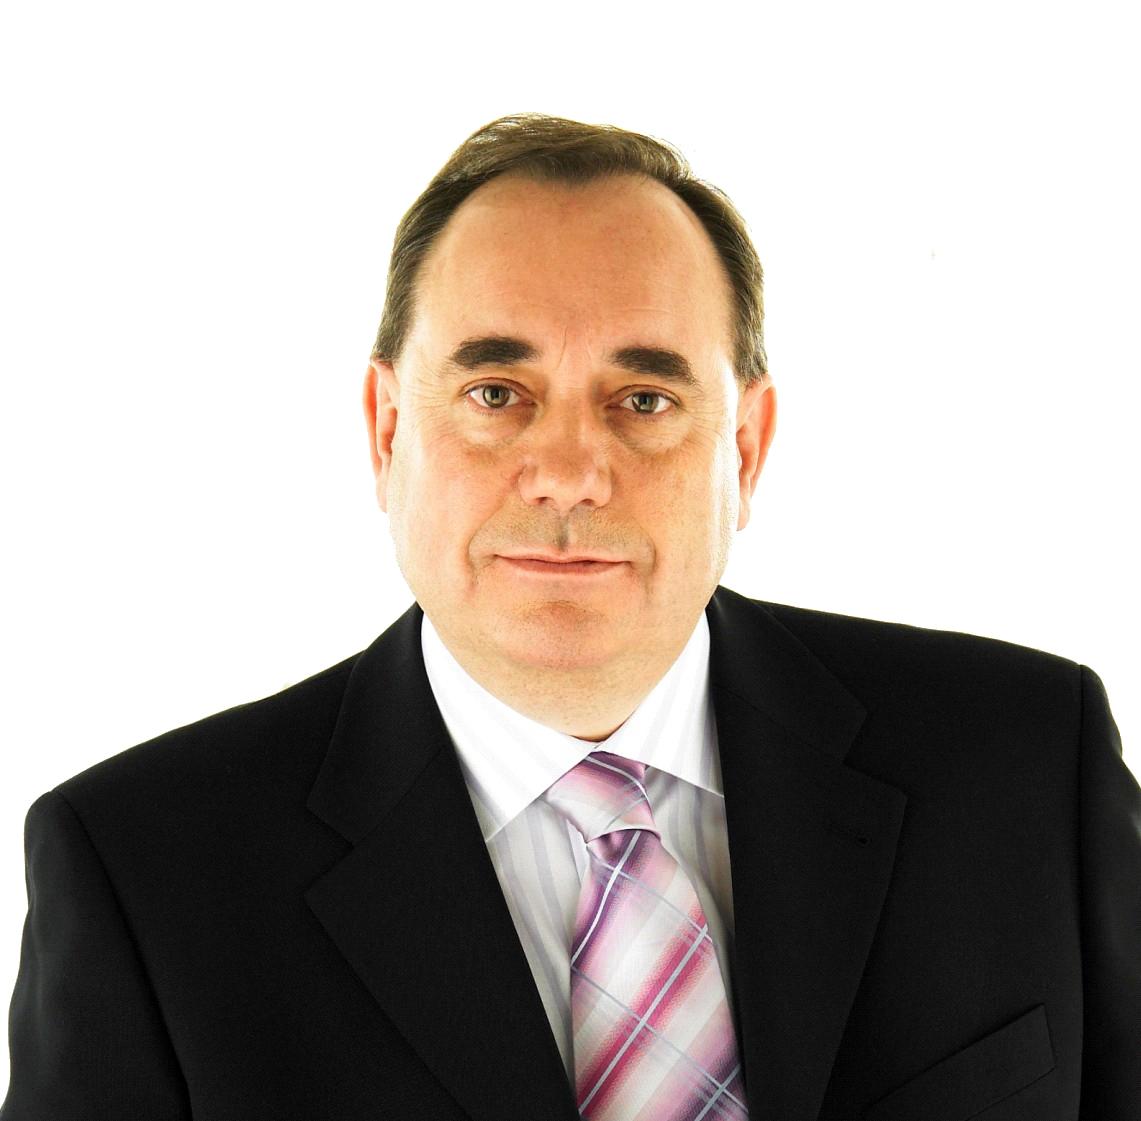 MSP Alex Salmond